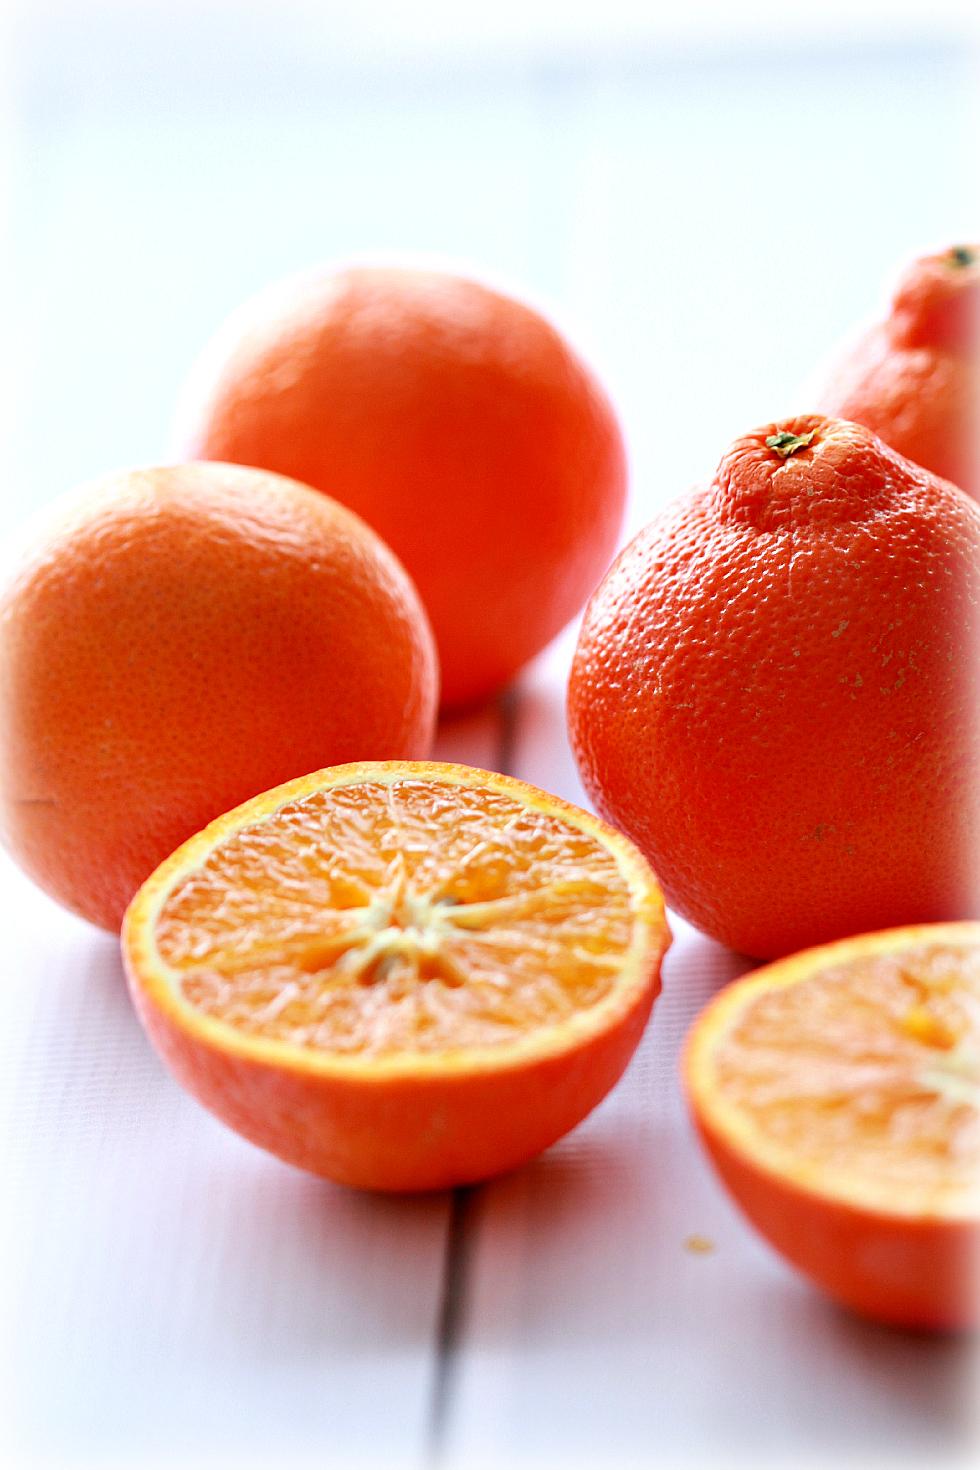 © Oranges! by Dena T Bray